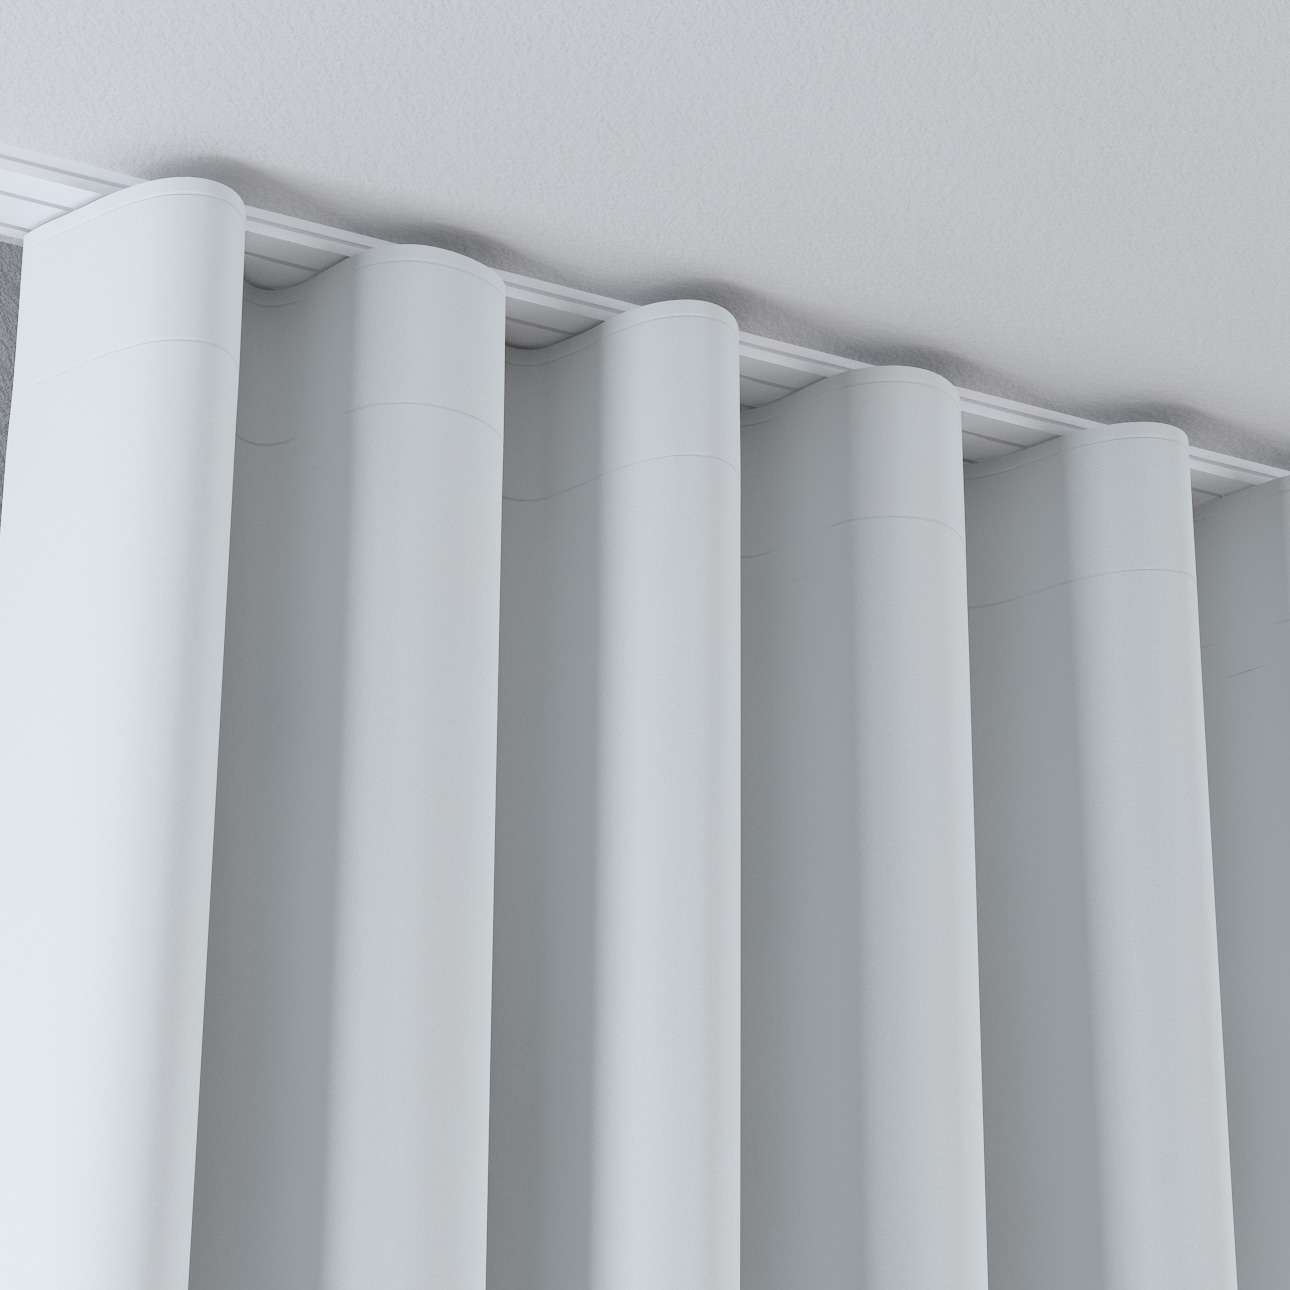 Zaves s riasením WAVE V kolekcii Blackout 280 cm, tkanina: 269-05